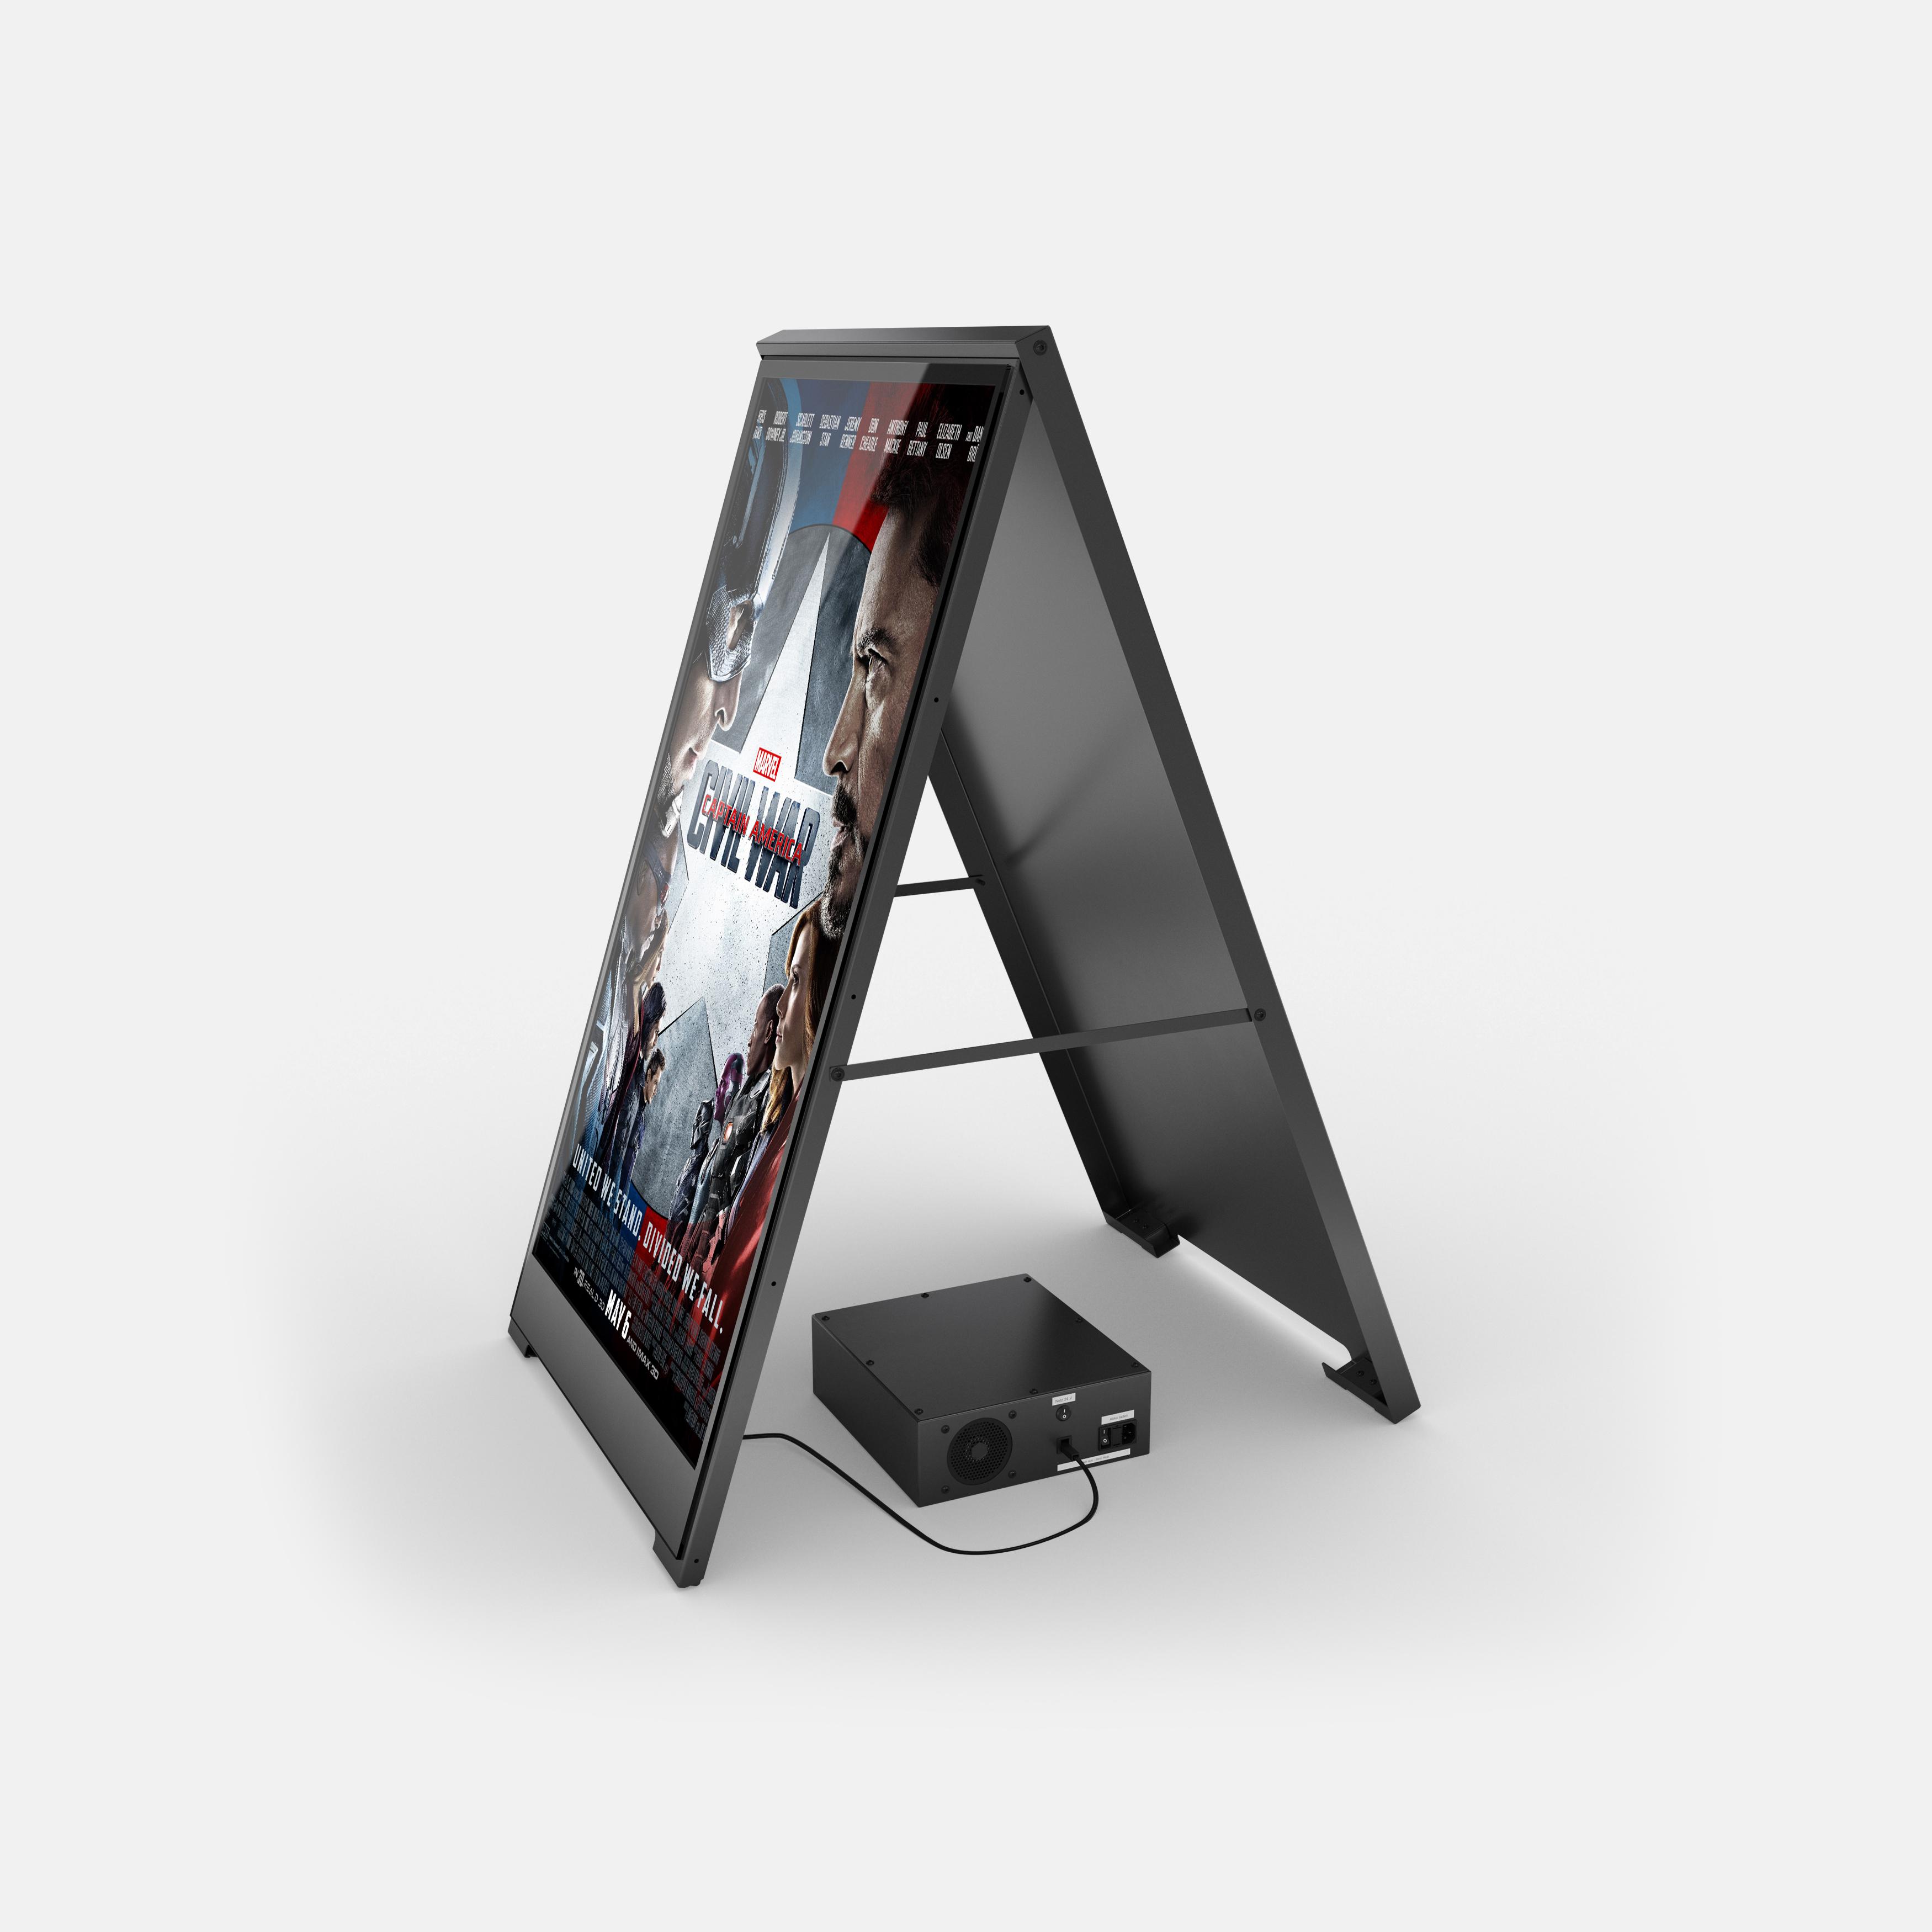 ZYGNAGE LCD Poster Kundenstopper mit Batterie